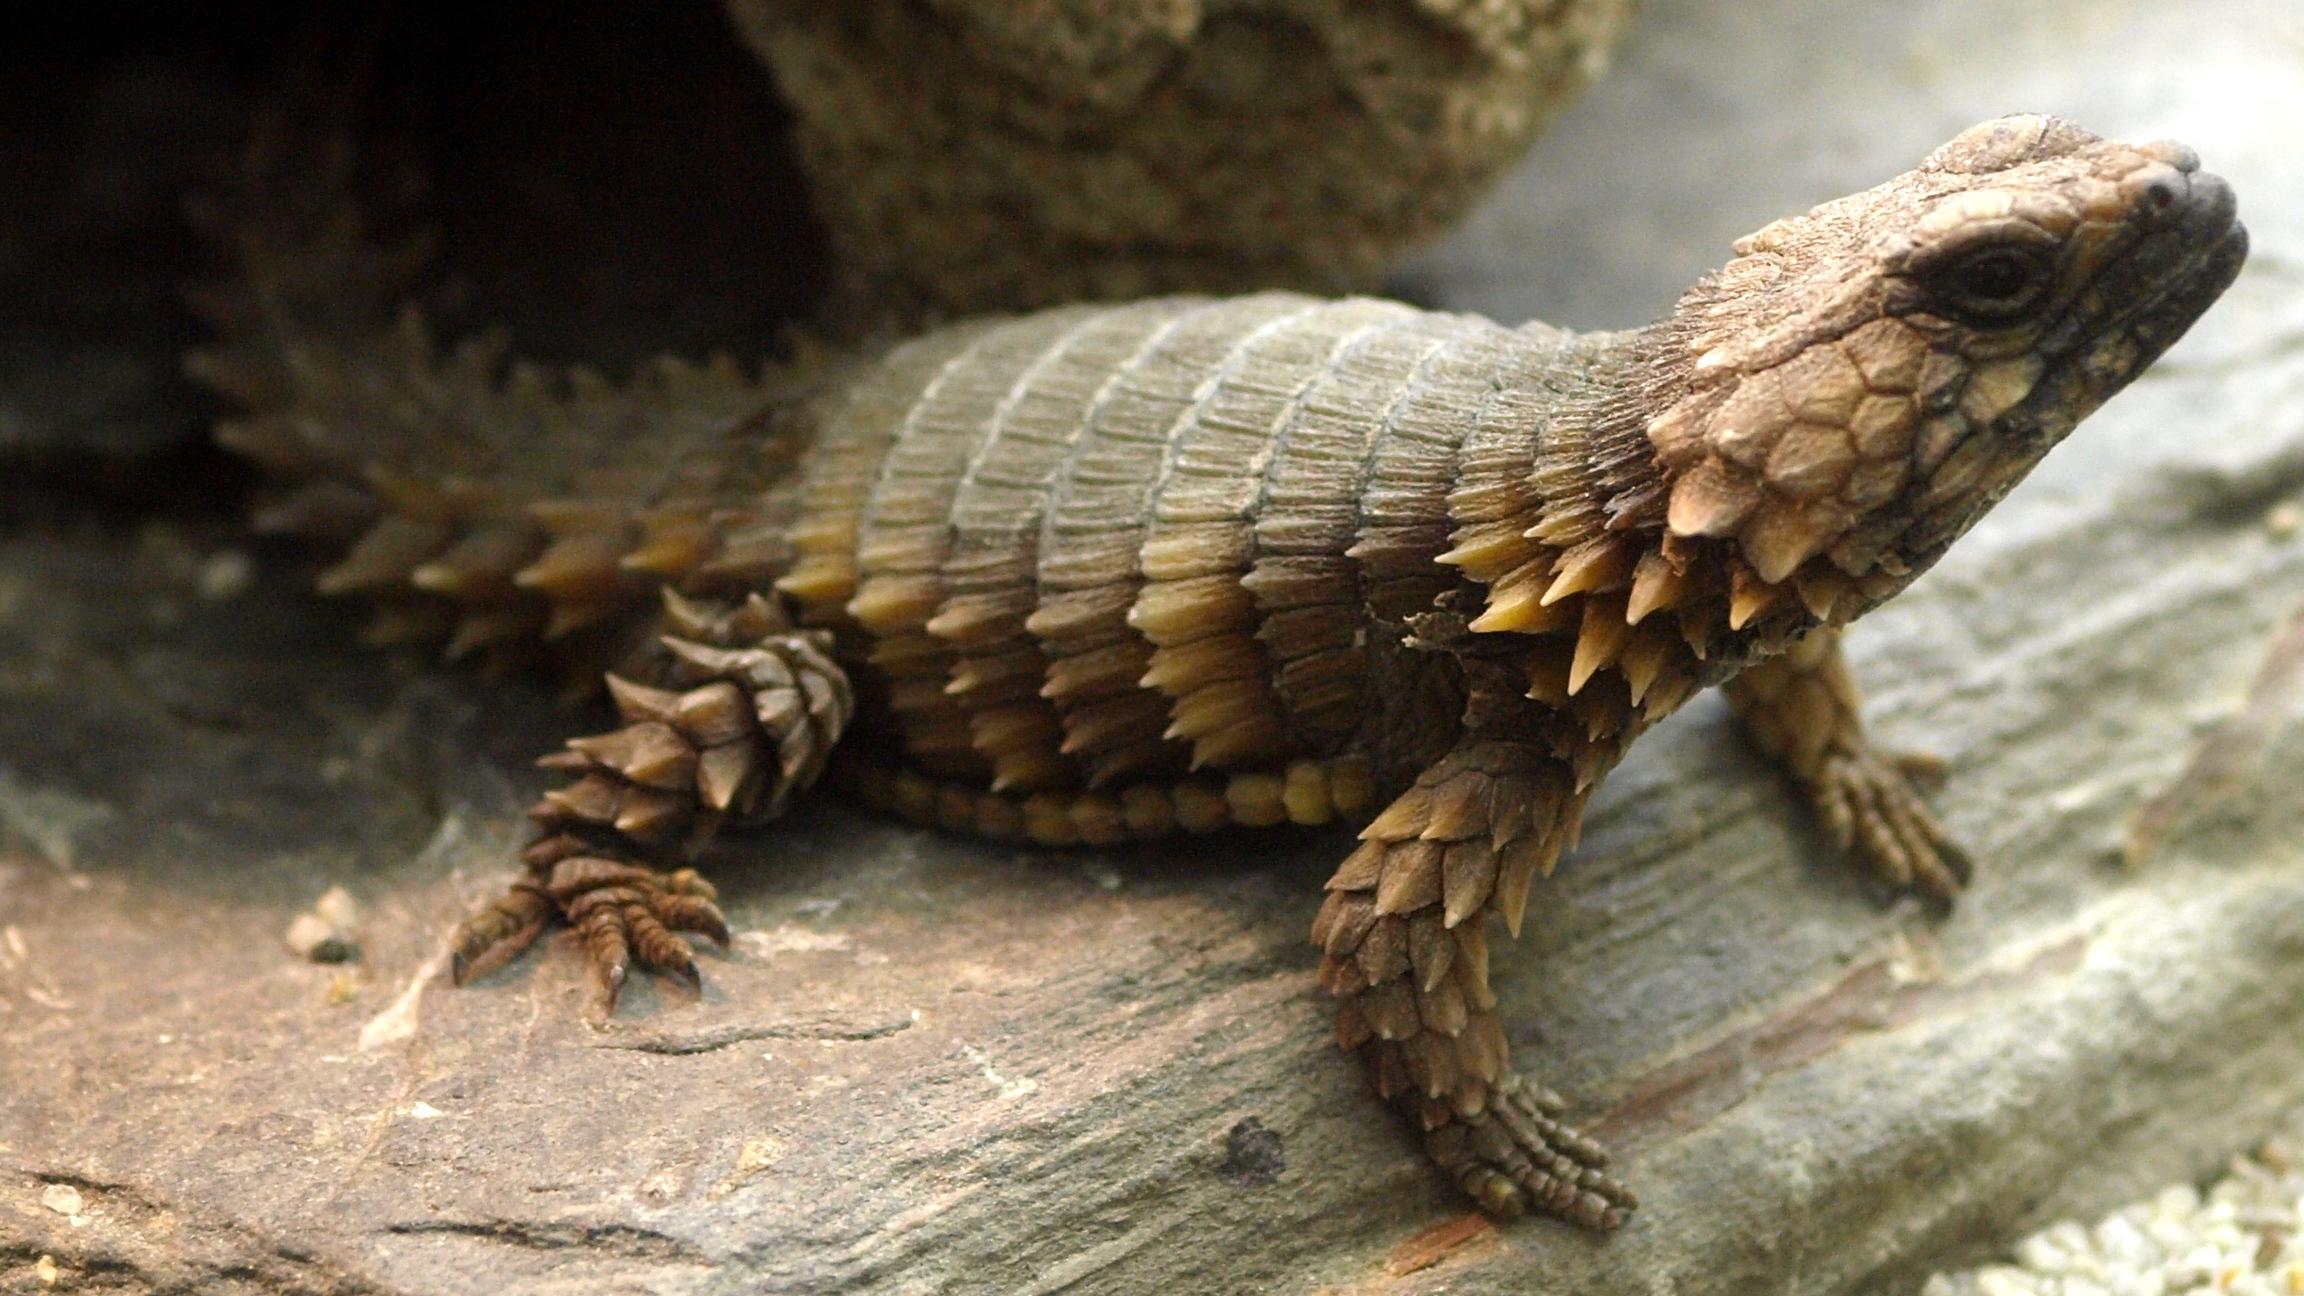 Armadillo-Girdled-Lizard-wallpaper-wp5403384